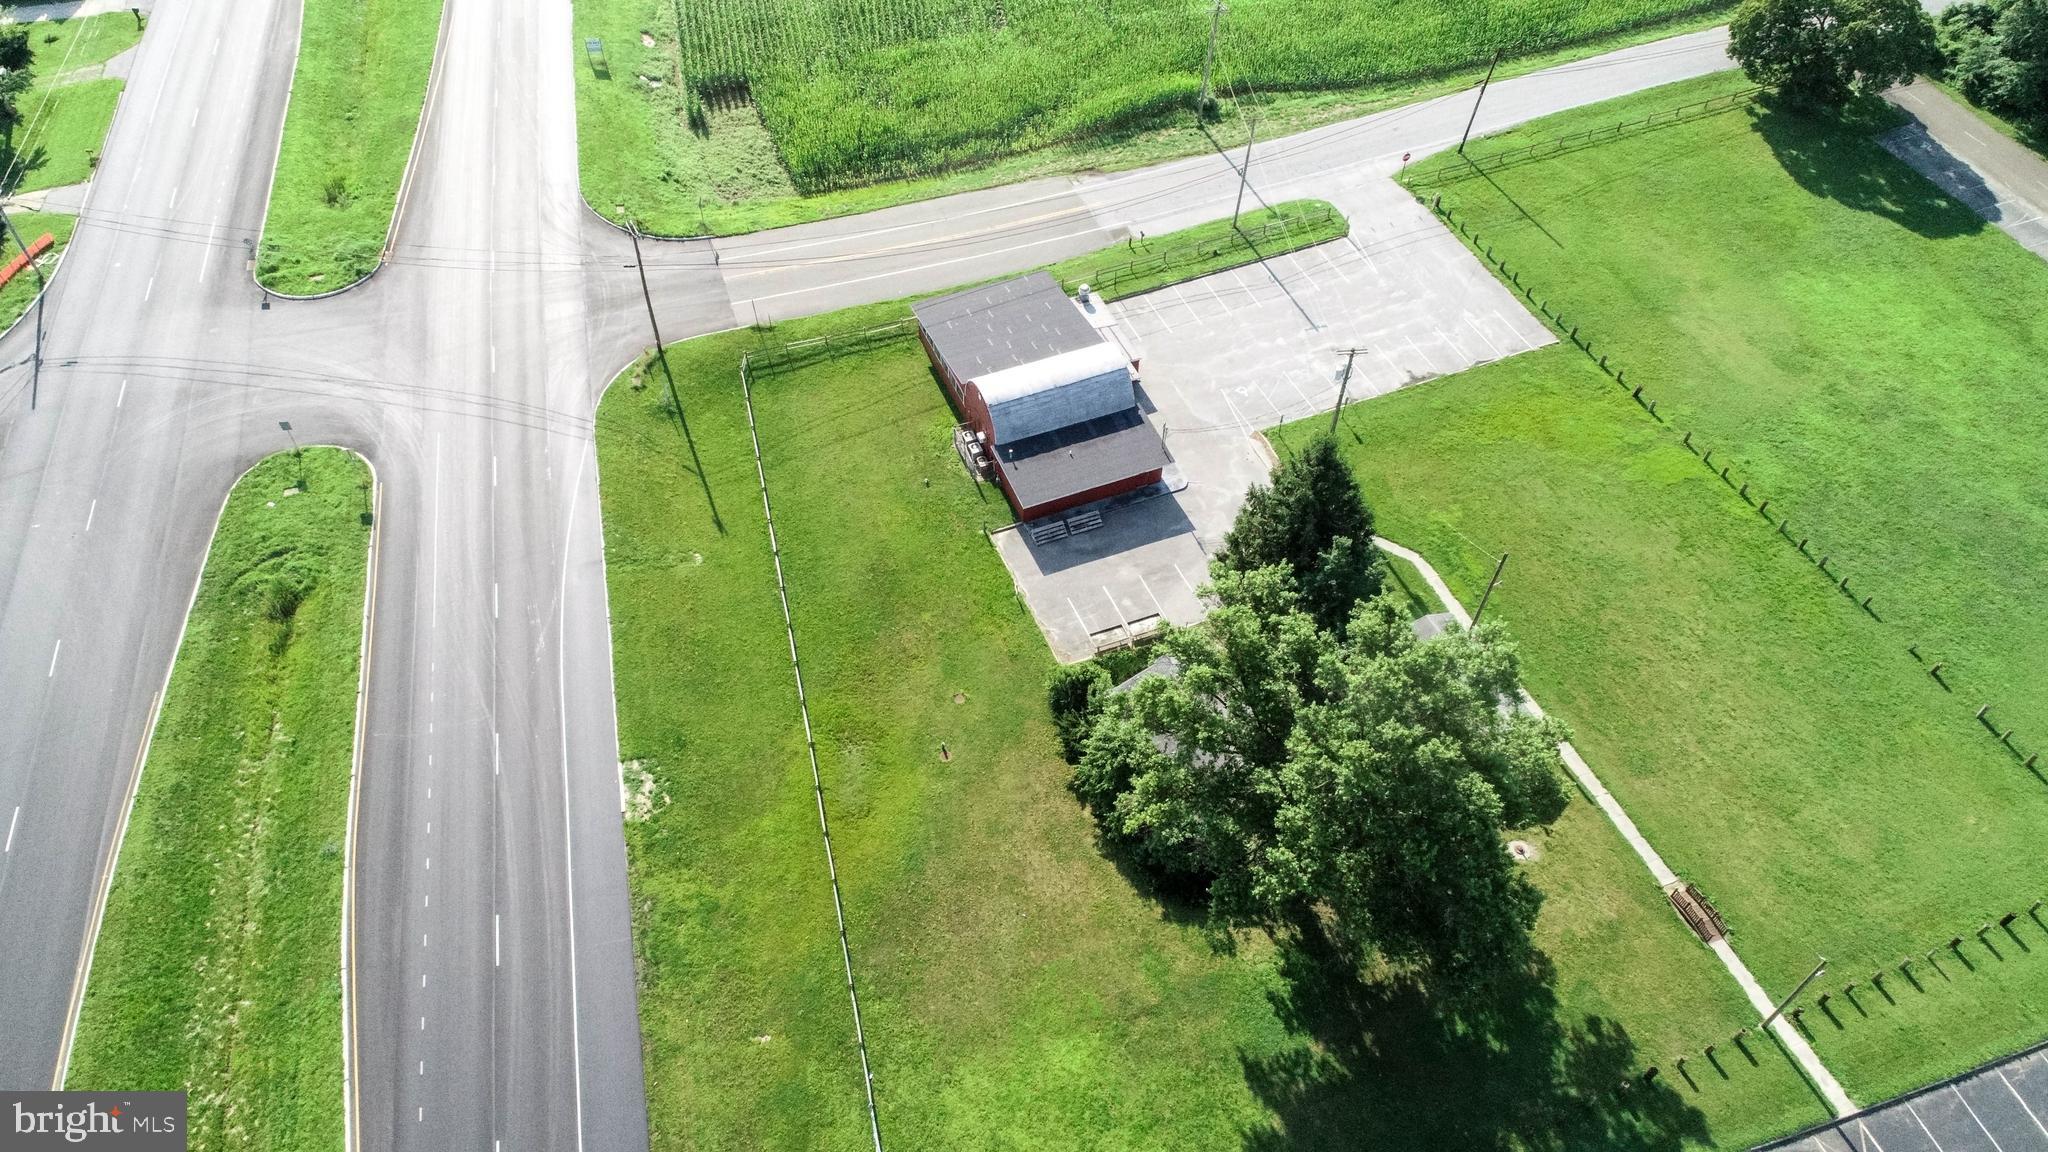 896 COURSES LANDING ROAD, PENNS GROVE, NJ 08069